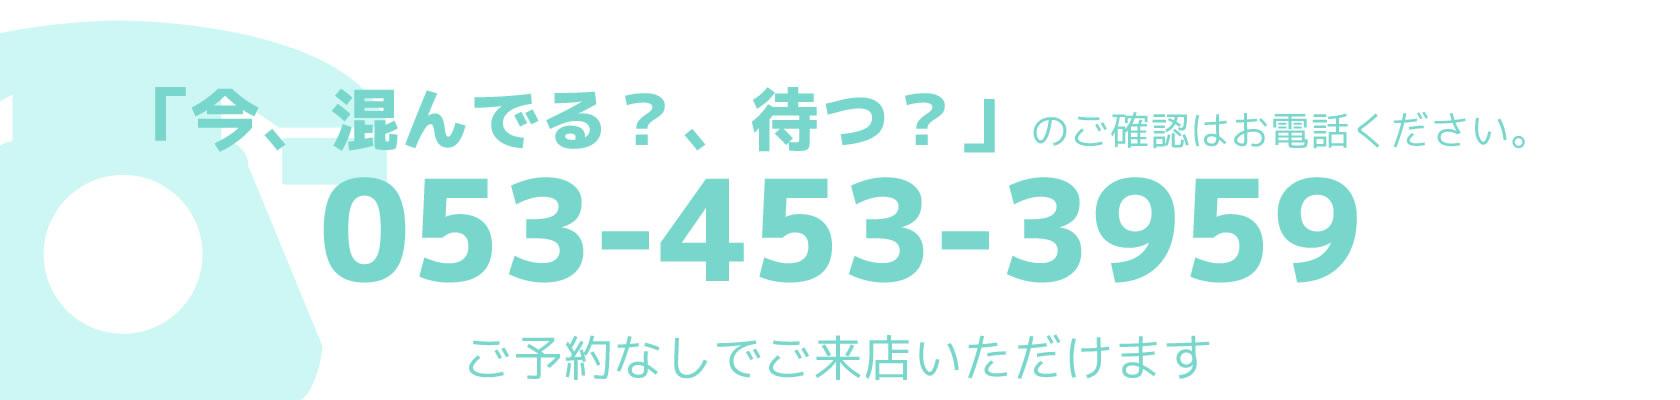 Contact – お問い合わせ